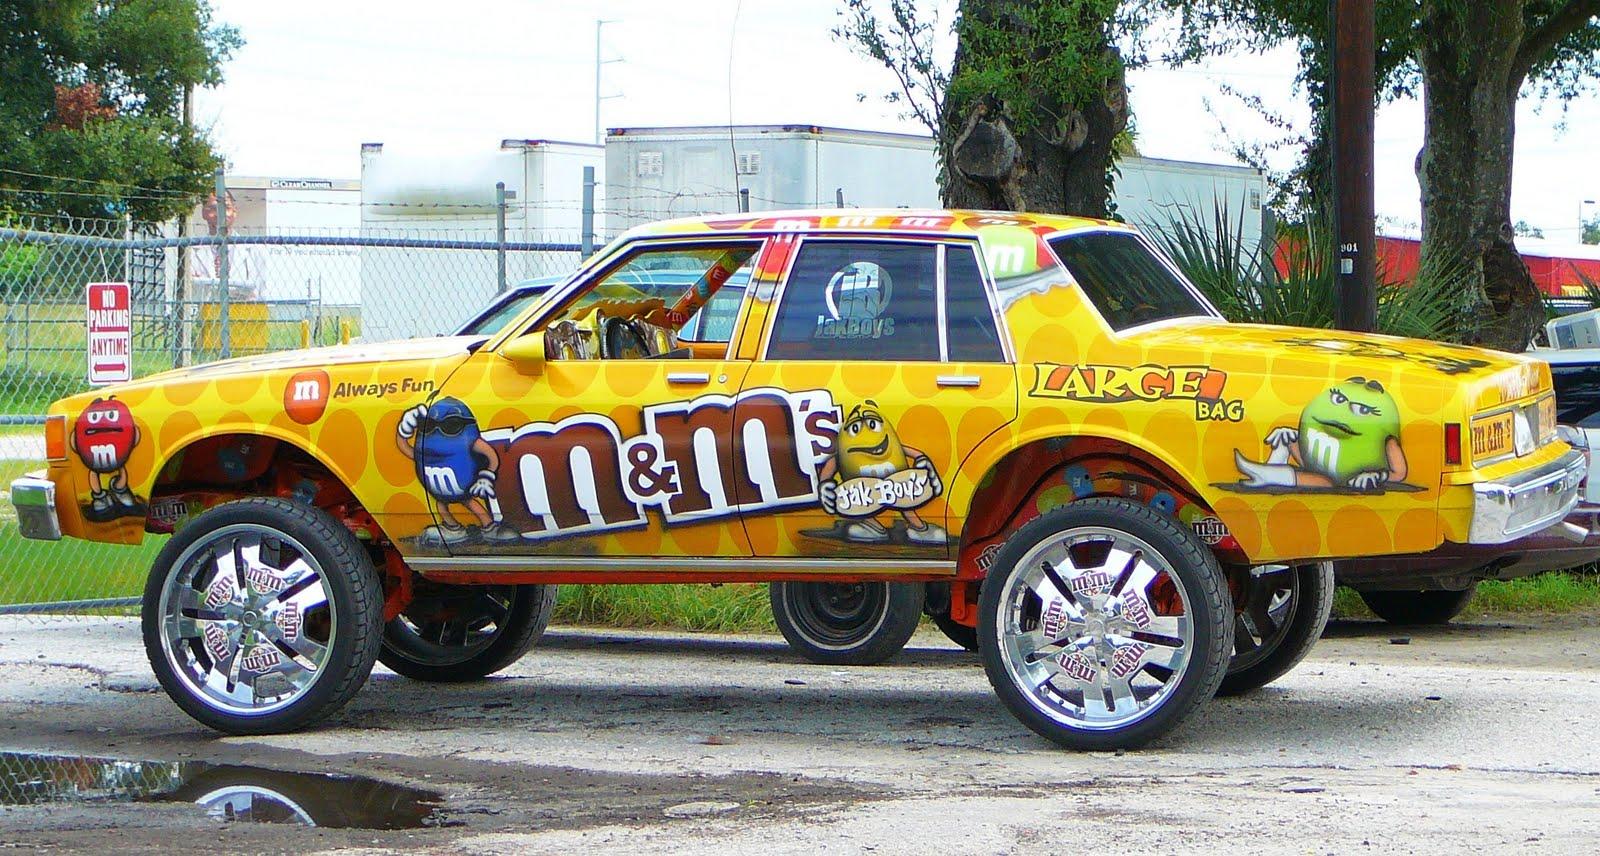 M+and+M+Jak+Boys+car+(2).jpg